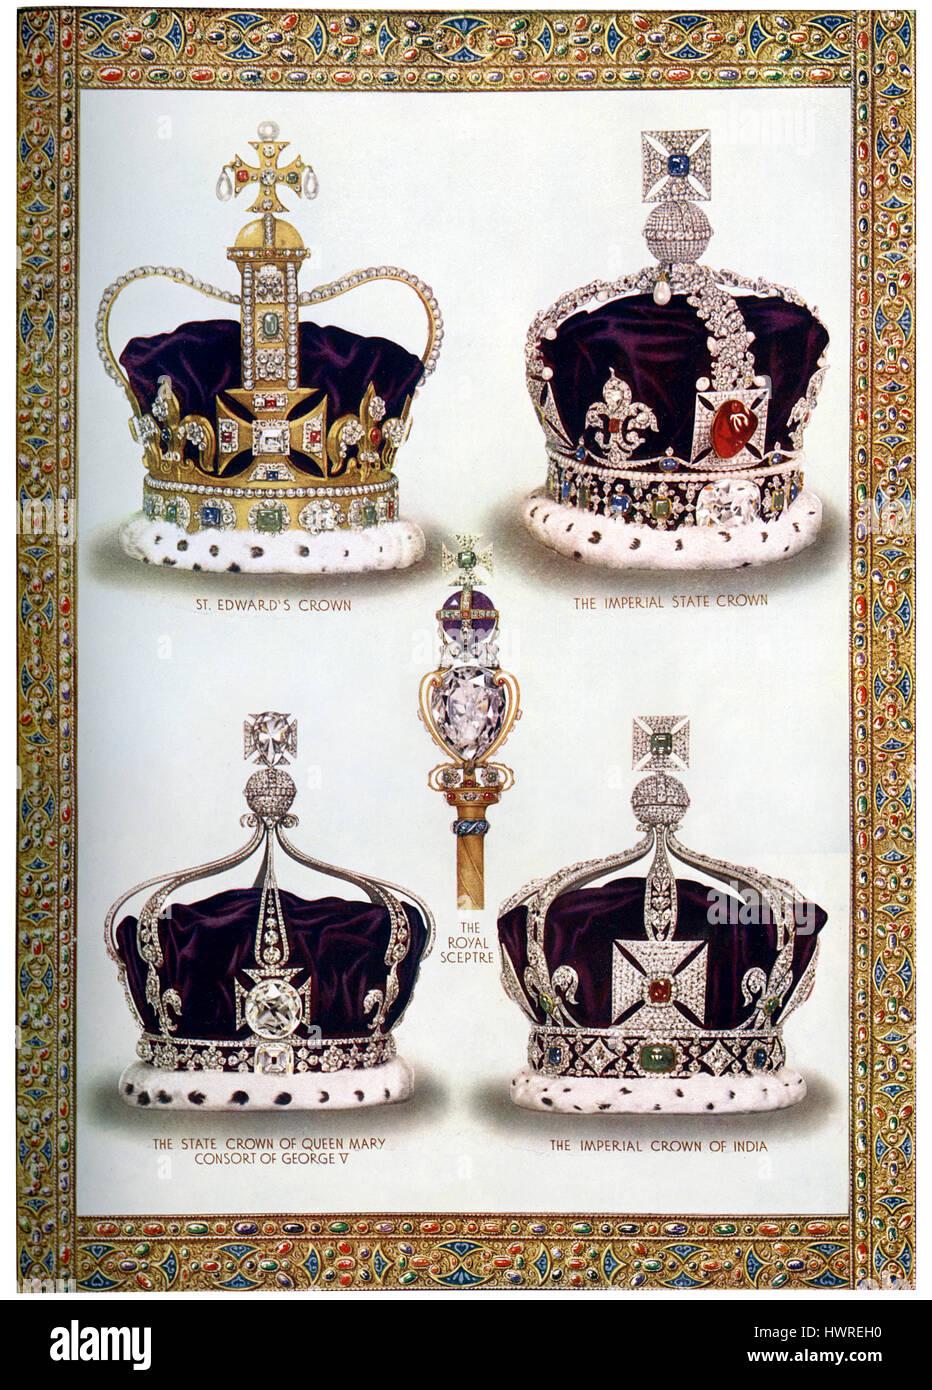 77 Best ENGLANDS CROWN JEWELS images  Crown jewels